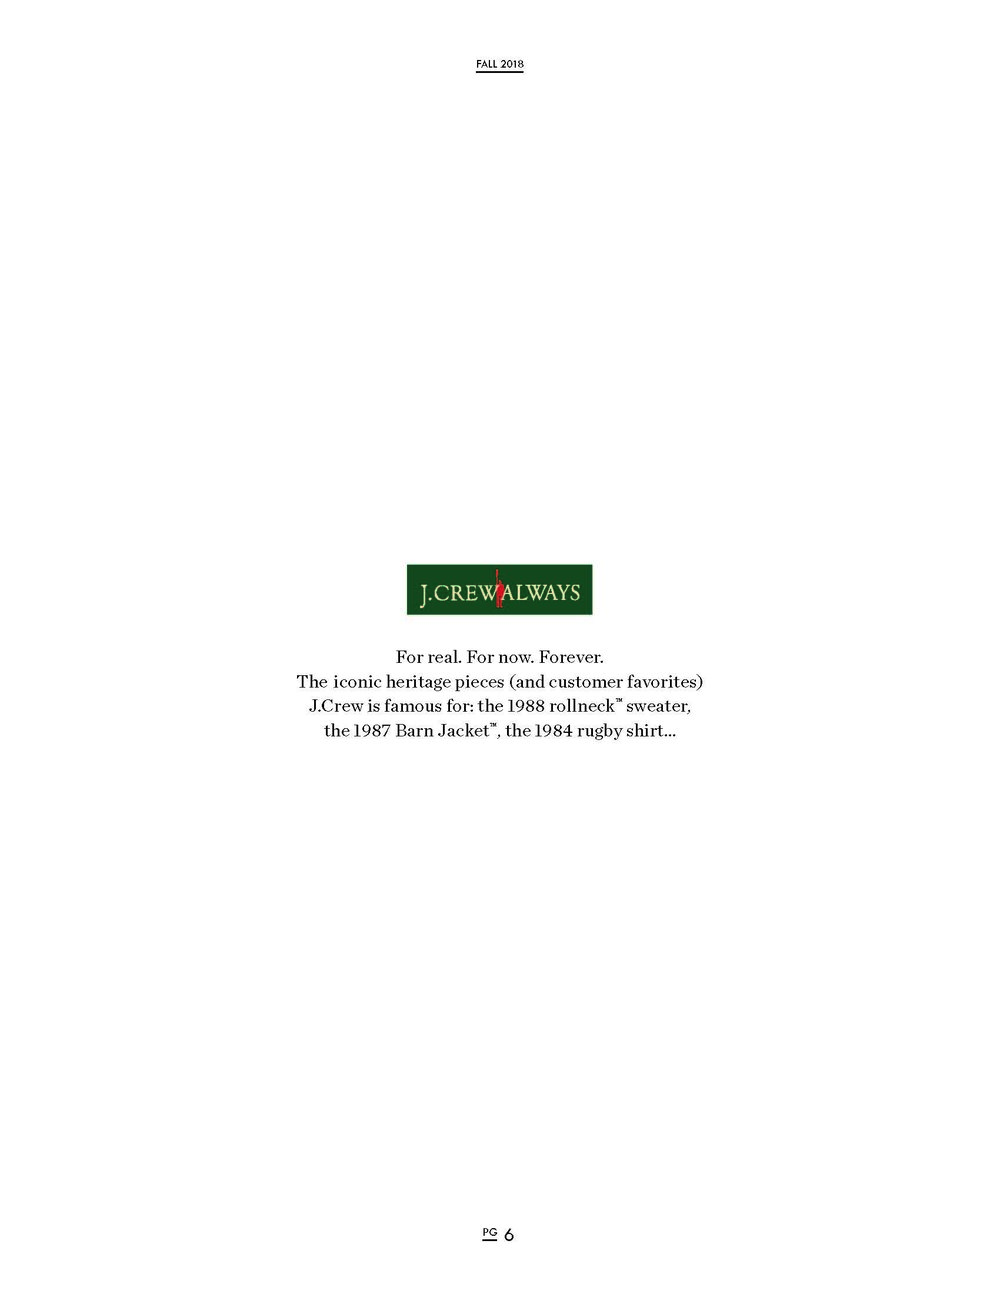 JCW004_WholesaleLookbook_FA18_Ipad_Page_06.jpg